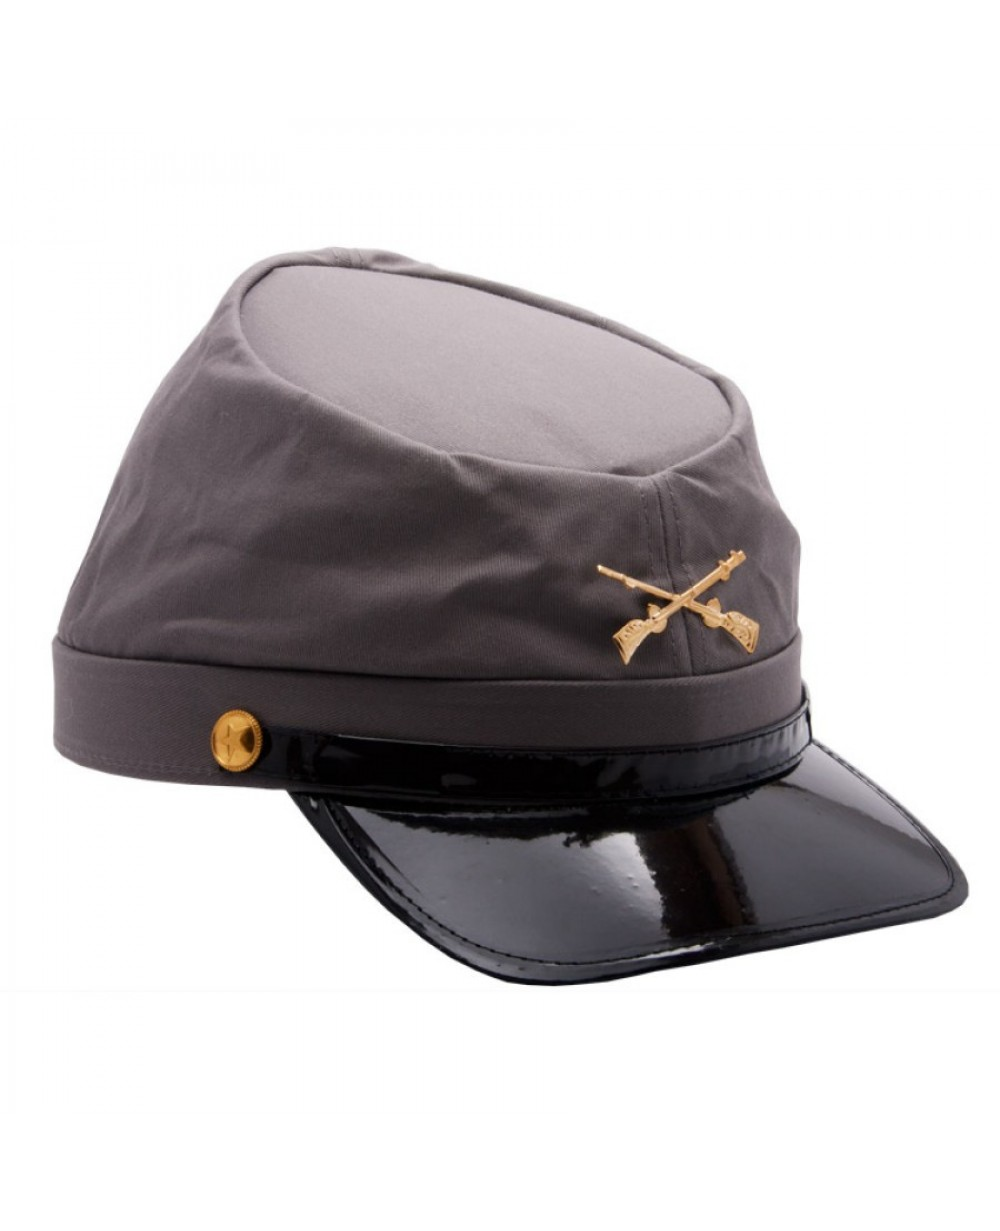 Union Army Hat